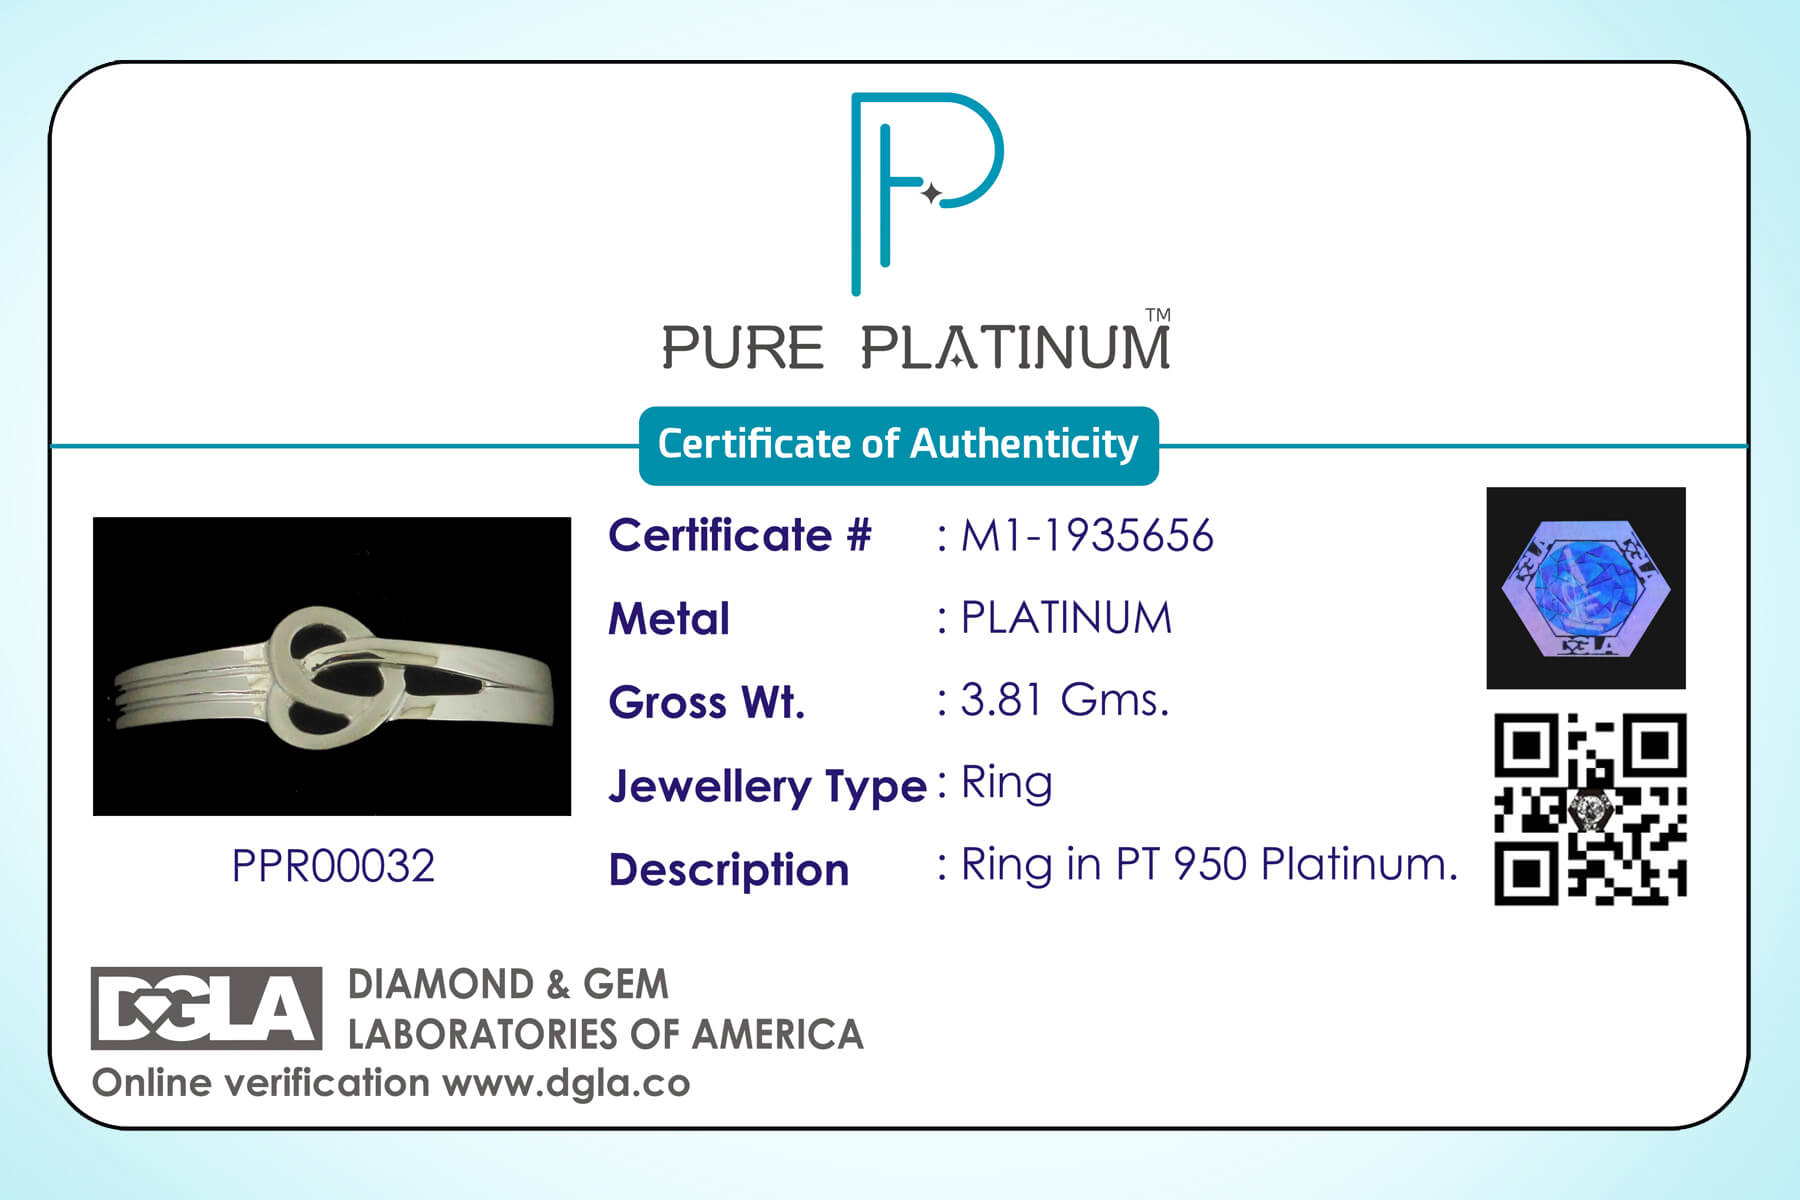 Diamond & Gem Laboratories of America